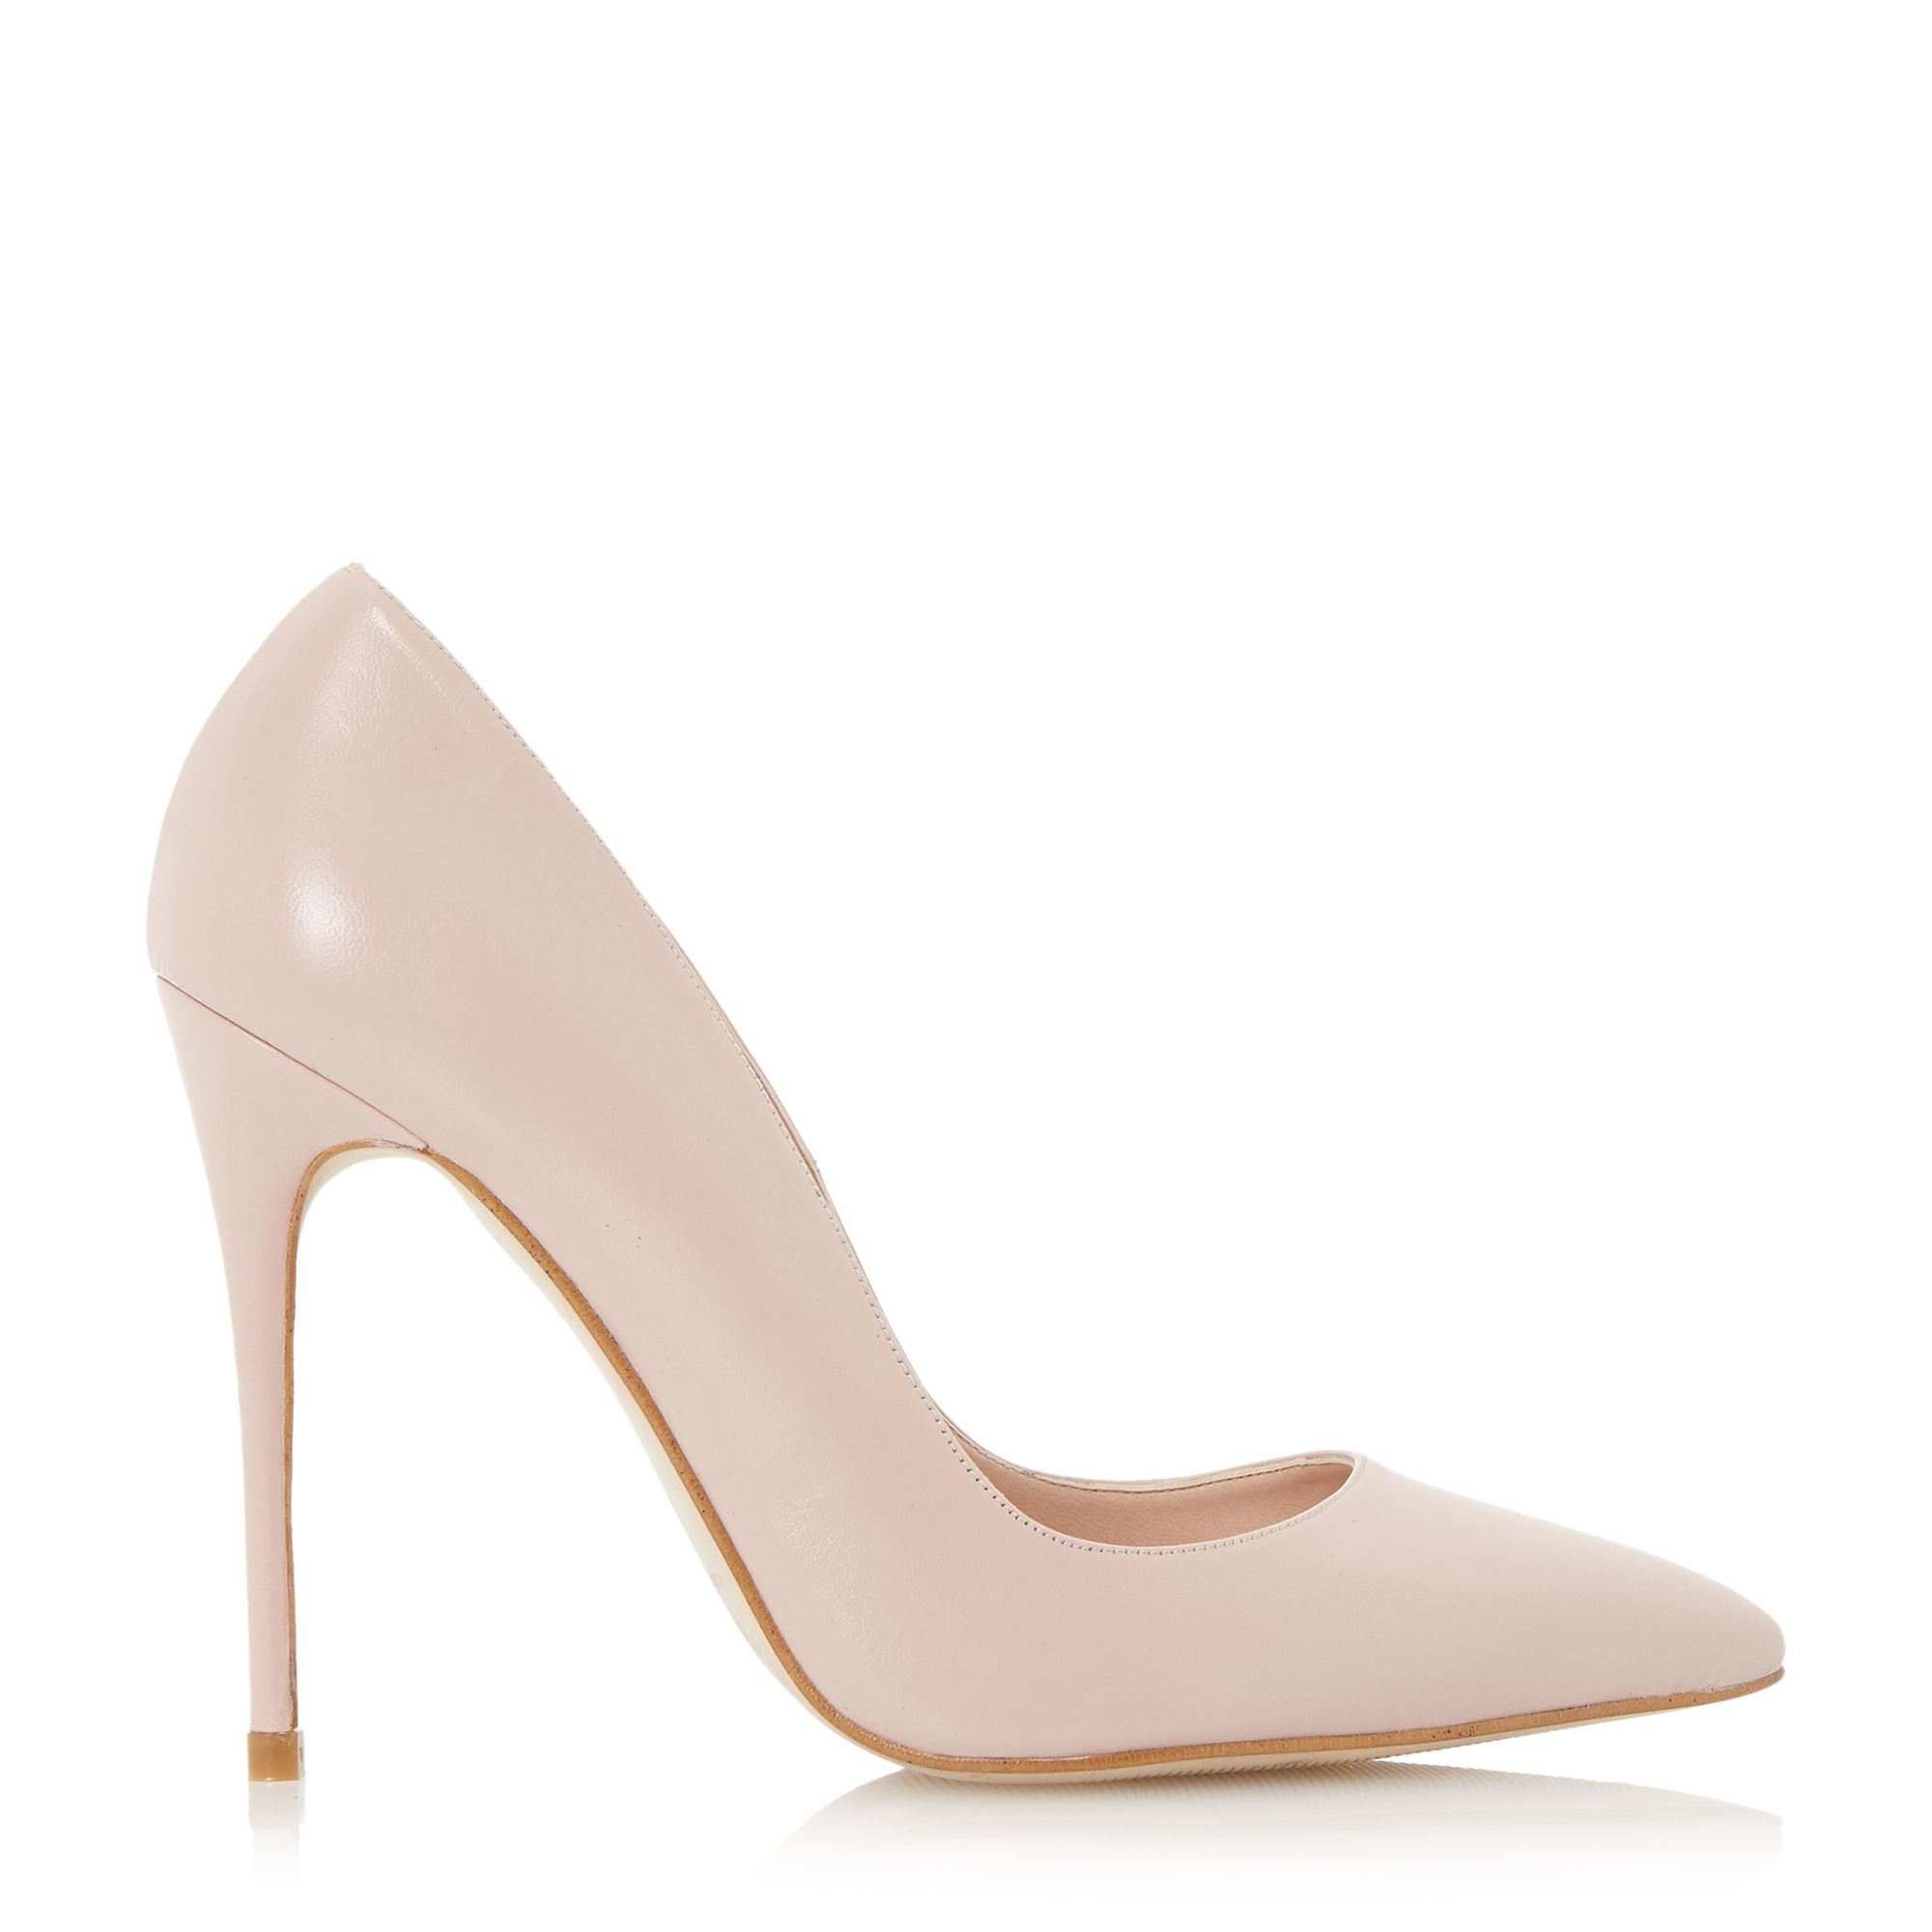 dune allegra pointed high heel court shoes in pink blush